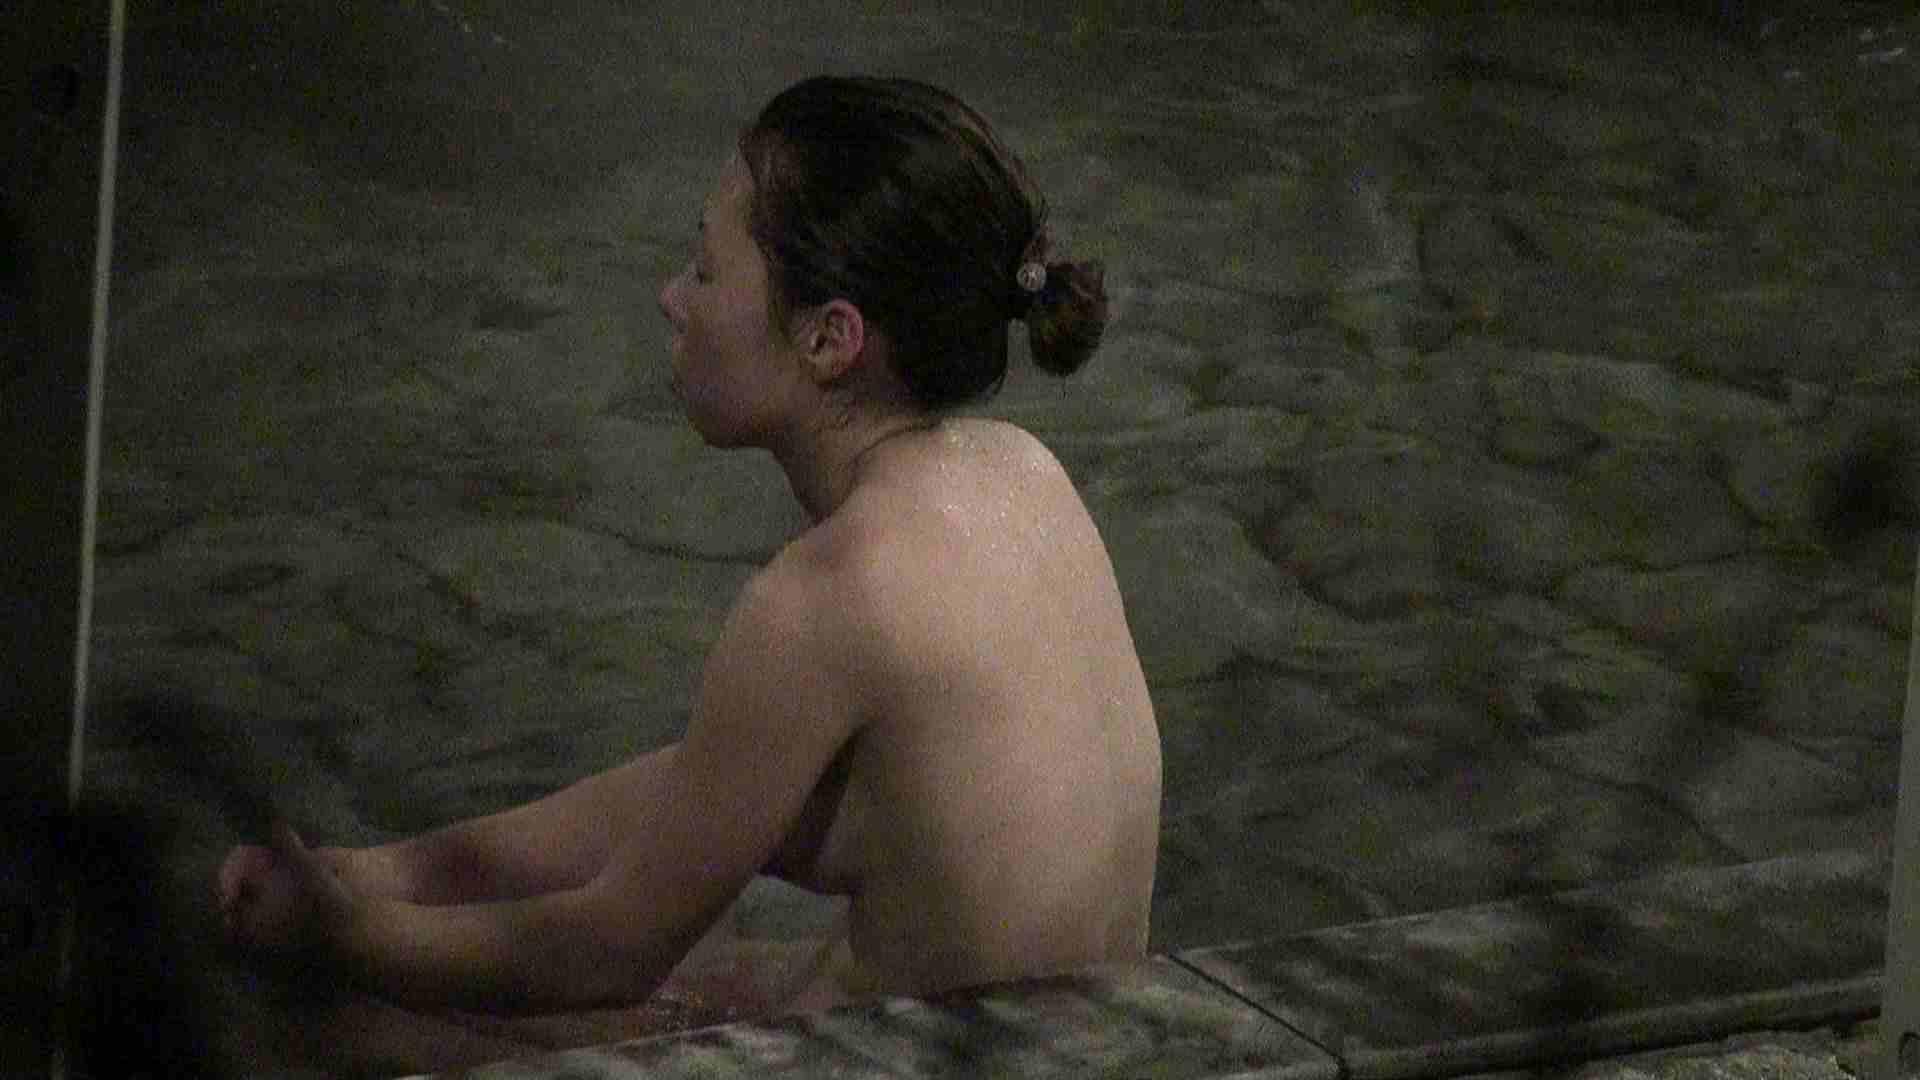 Aquaな露天風呂Vol.391 美しいOLの裸体 えろ無修正画像 99pic 92